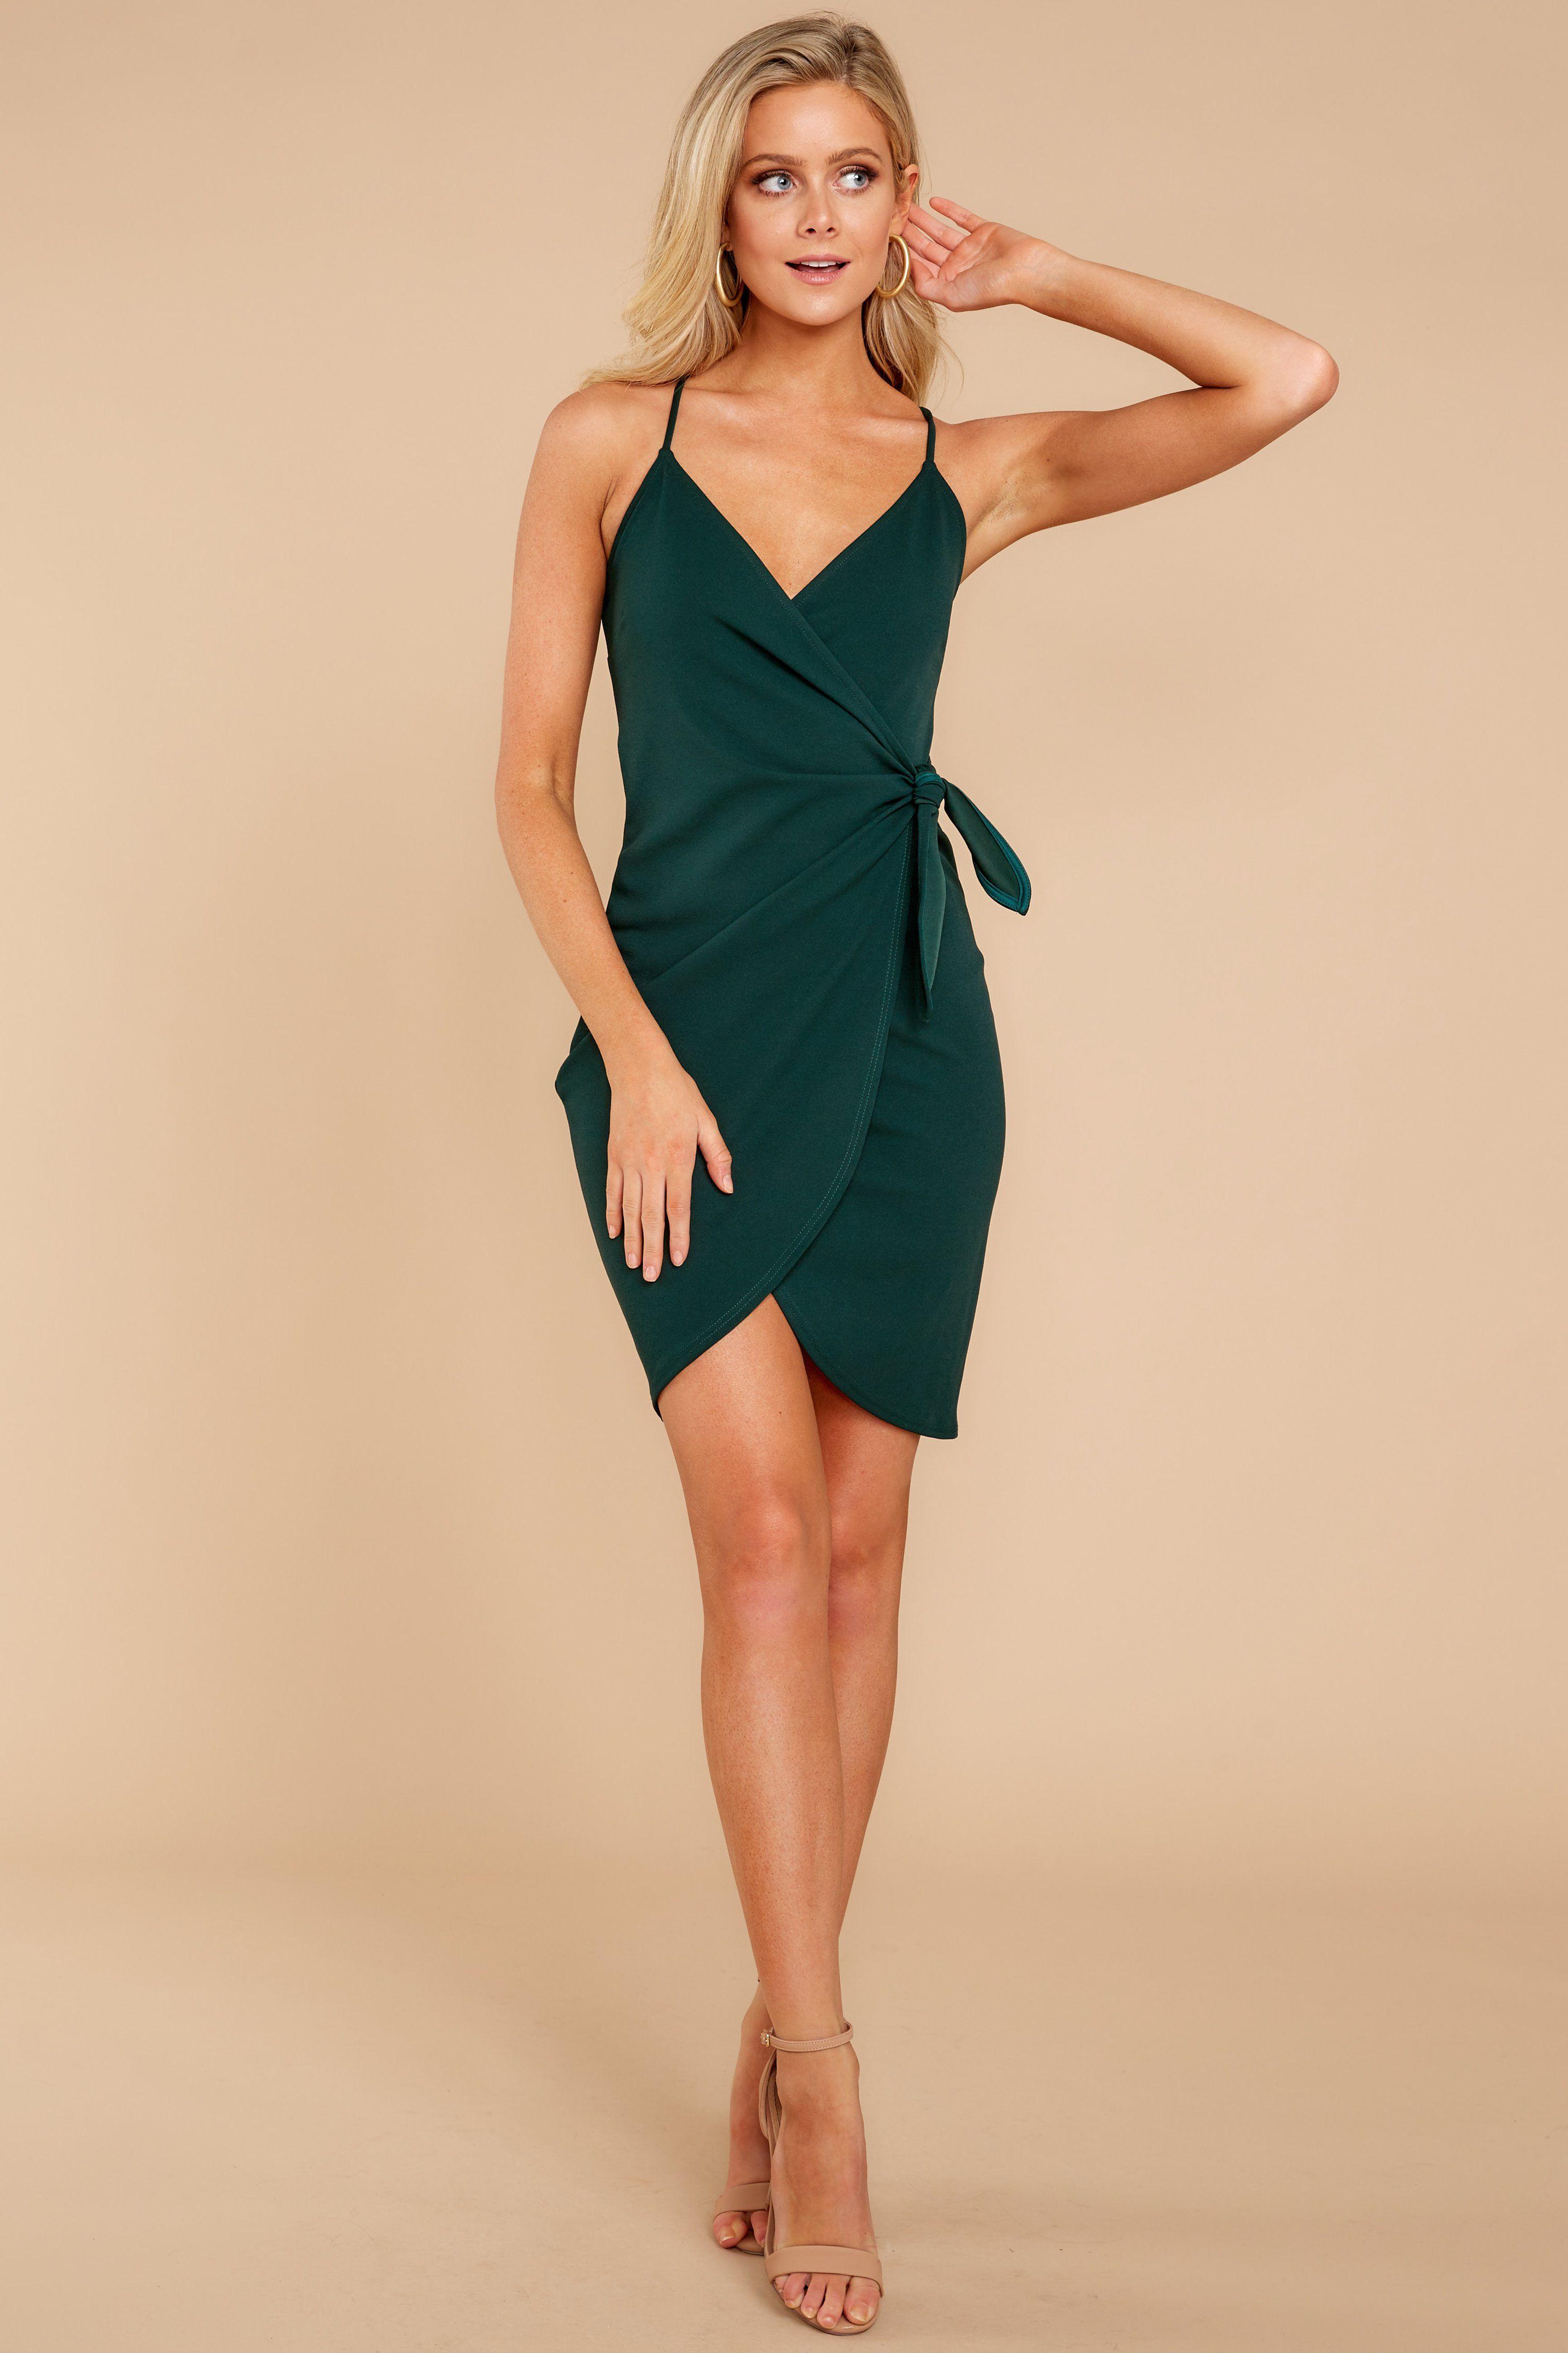 2fc98beb937d Hunter Green Wrap Dress - Sexy Dress - Dress -  38.00 – Red Dress Boutique